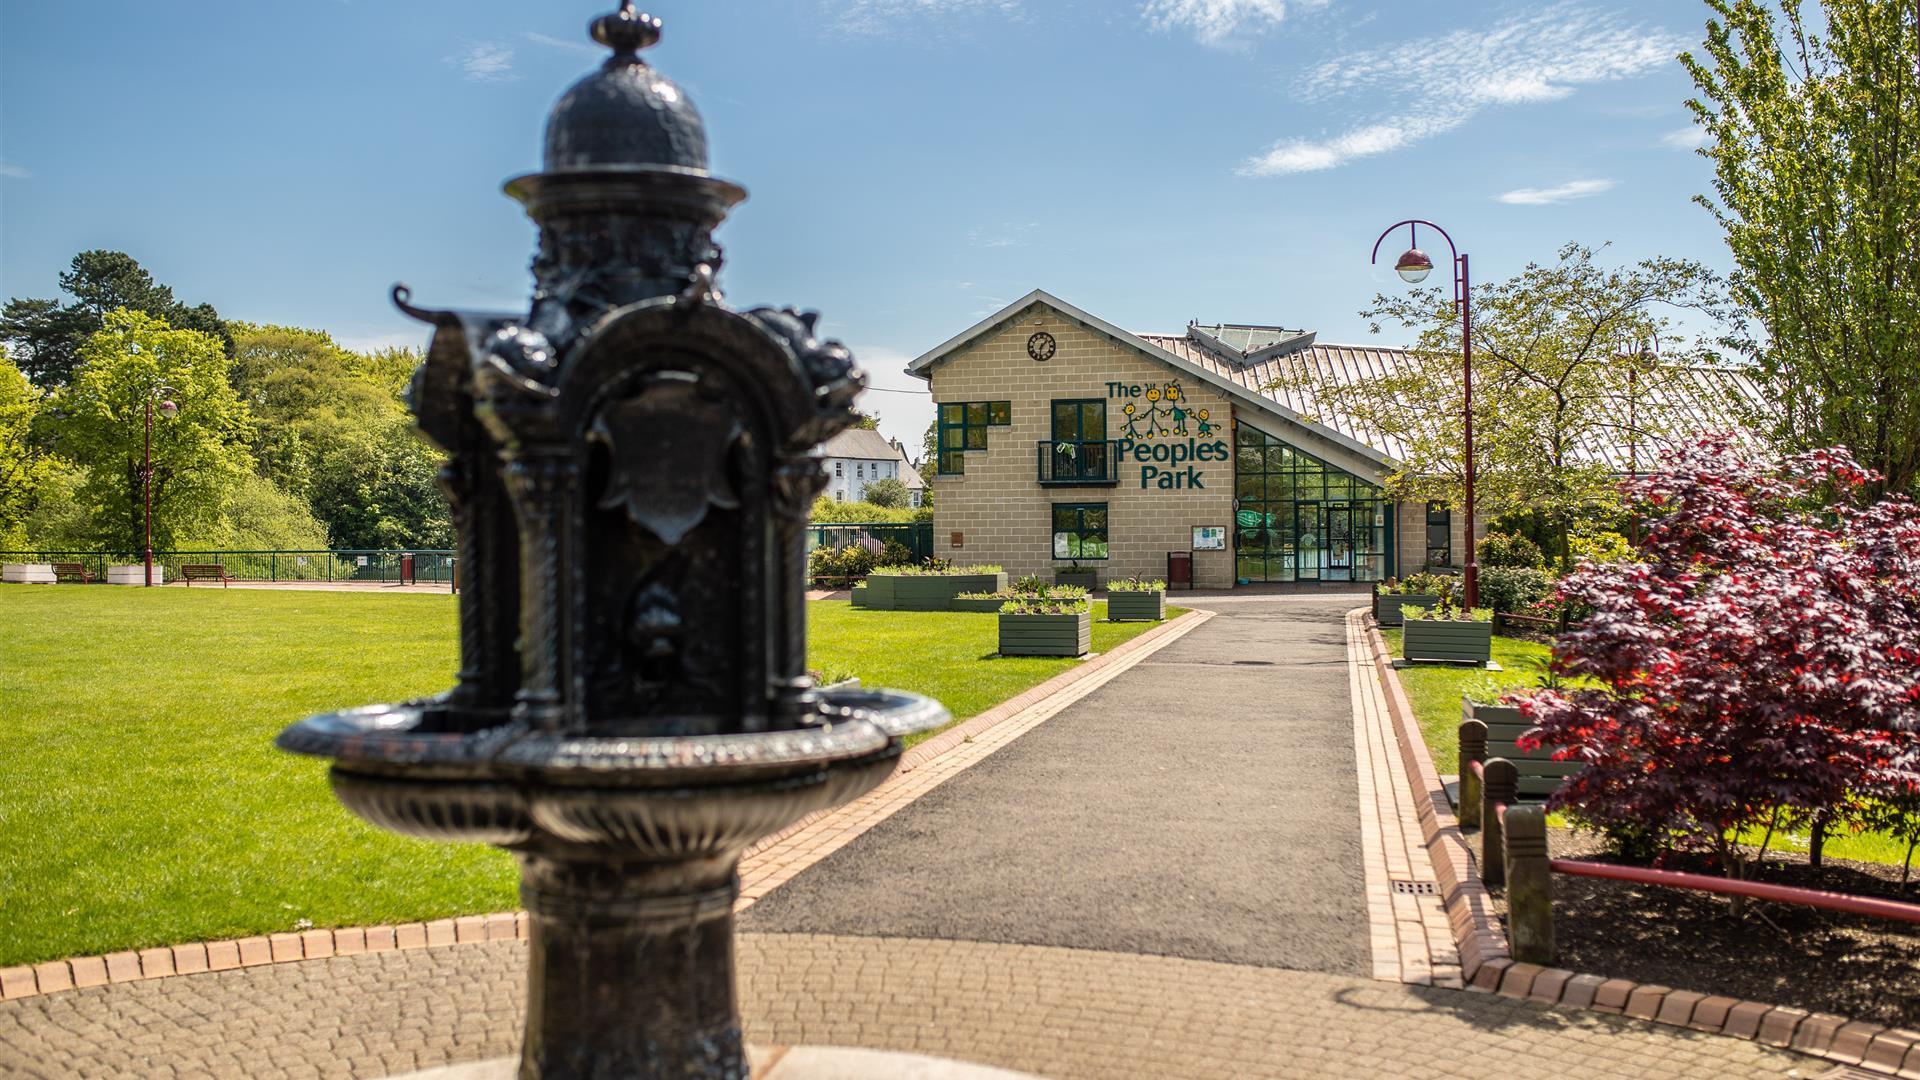 Ballymena's People's Park